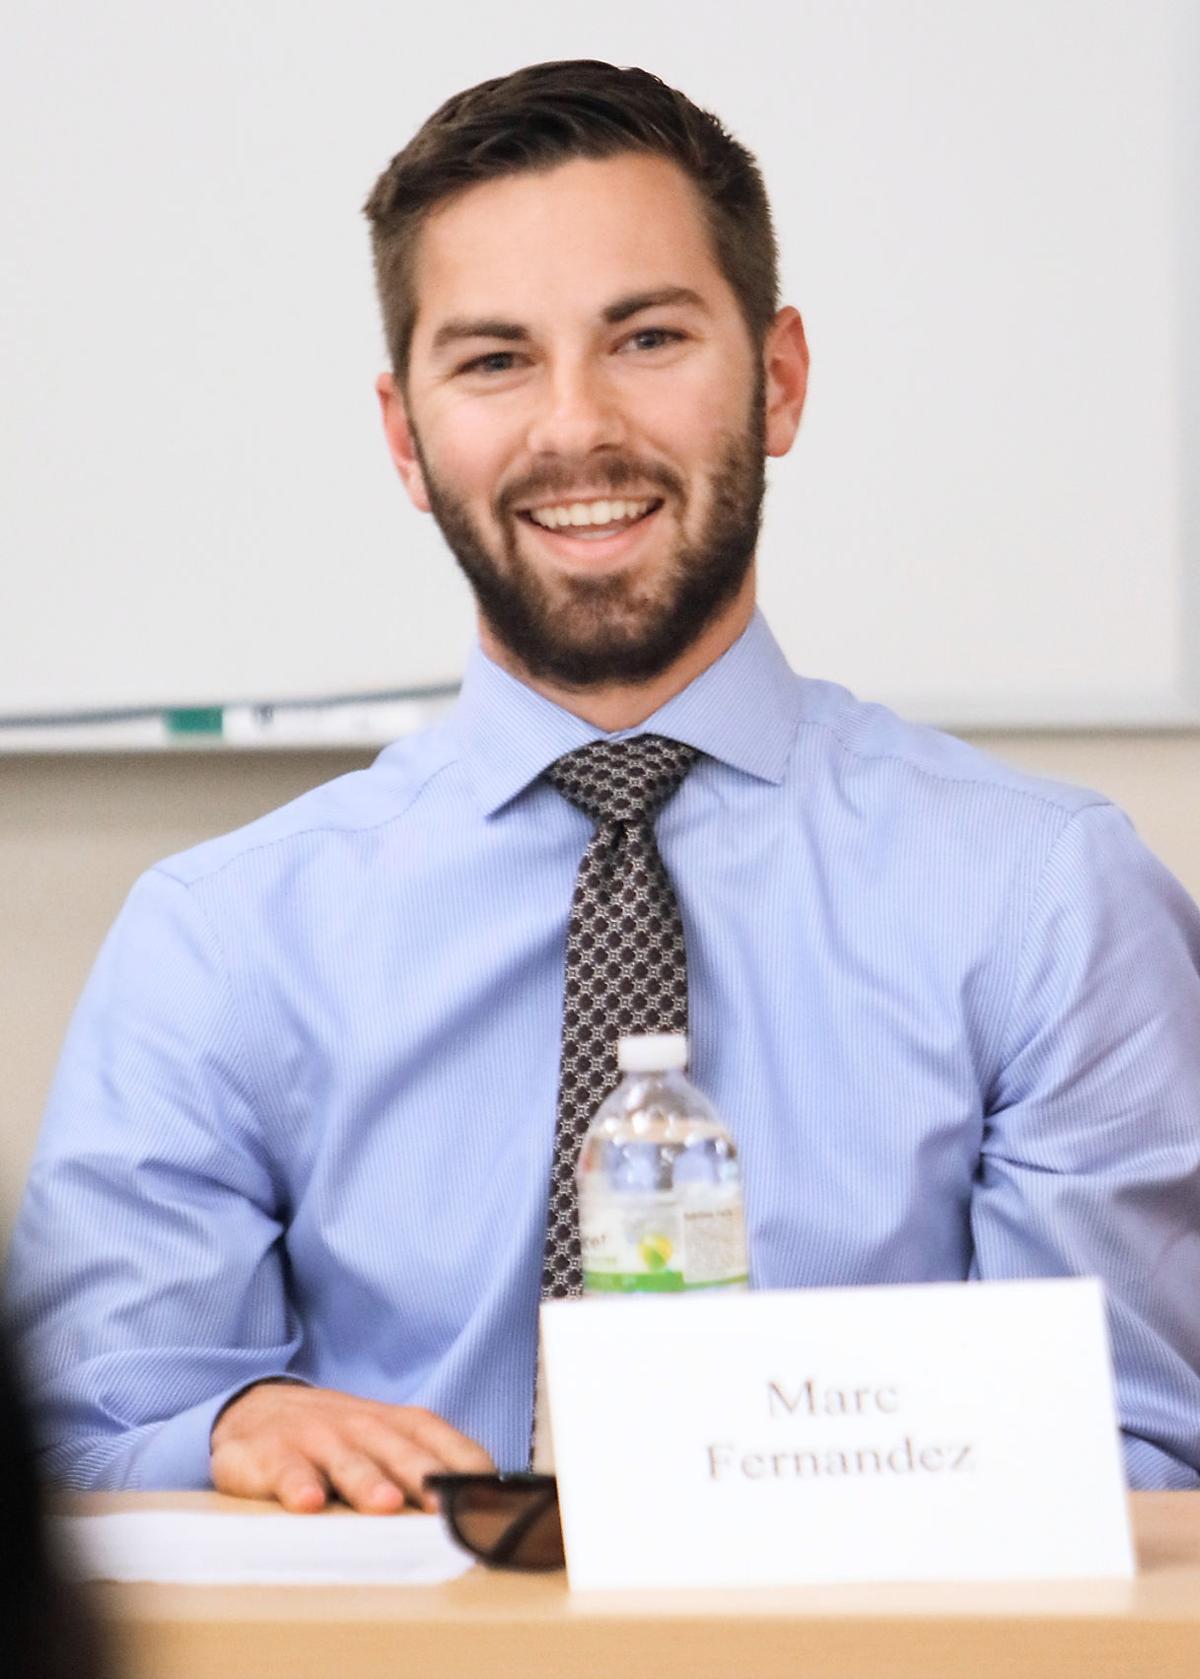 Marc Fernandez of Carpenters Middle School speaks at Maryville College